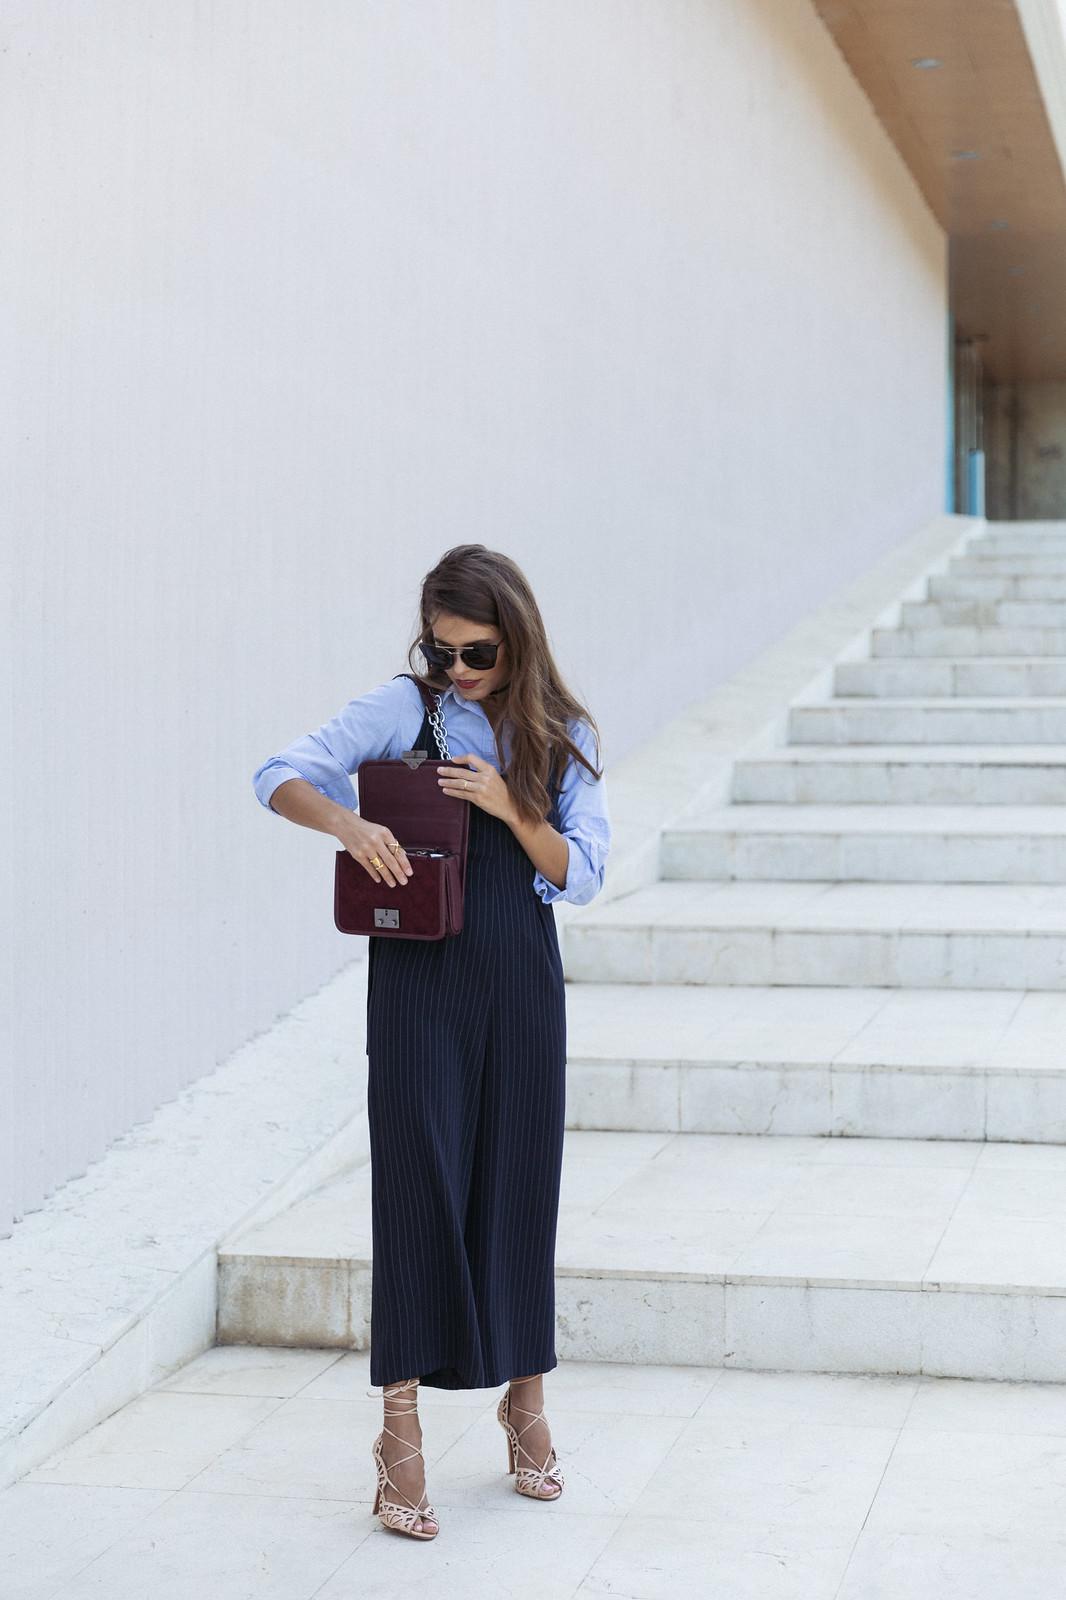 Jessie Chanes Seams for a desire - Pinstripped suit topshop heeled sandals schutz parfois bag  -5